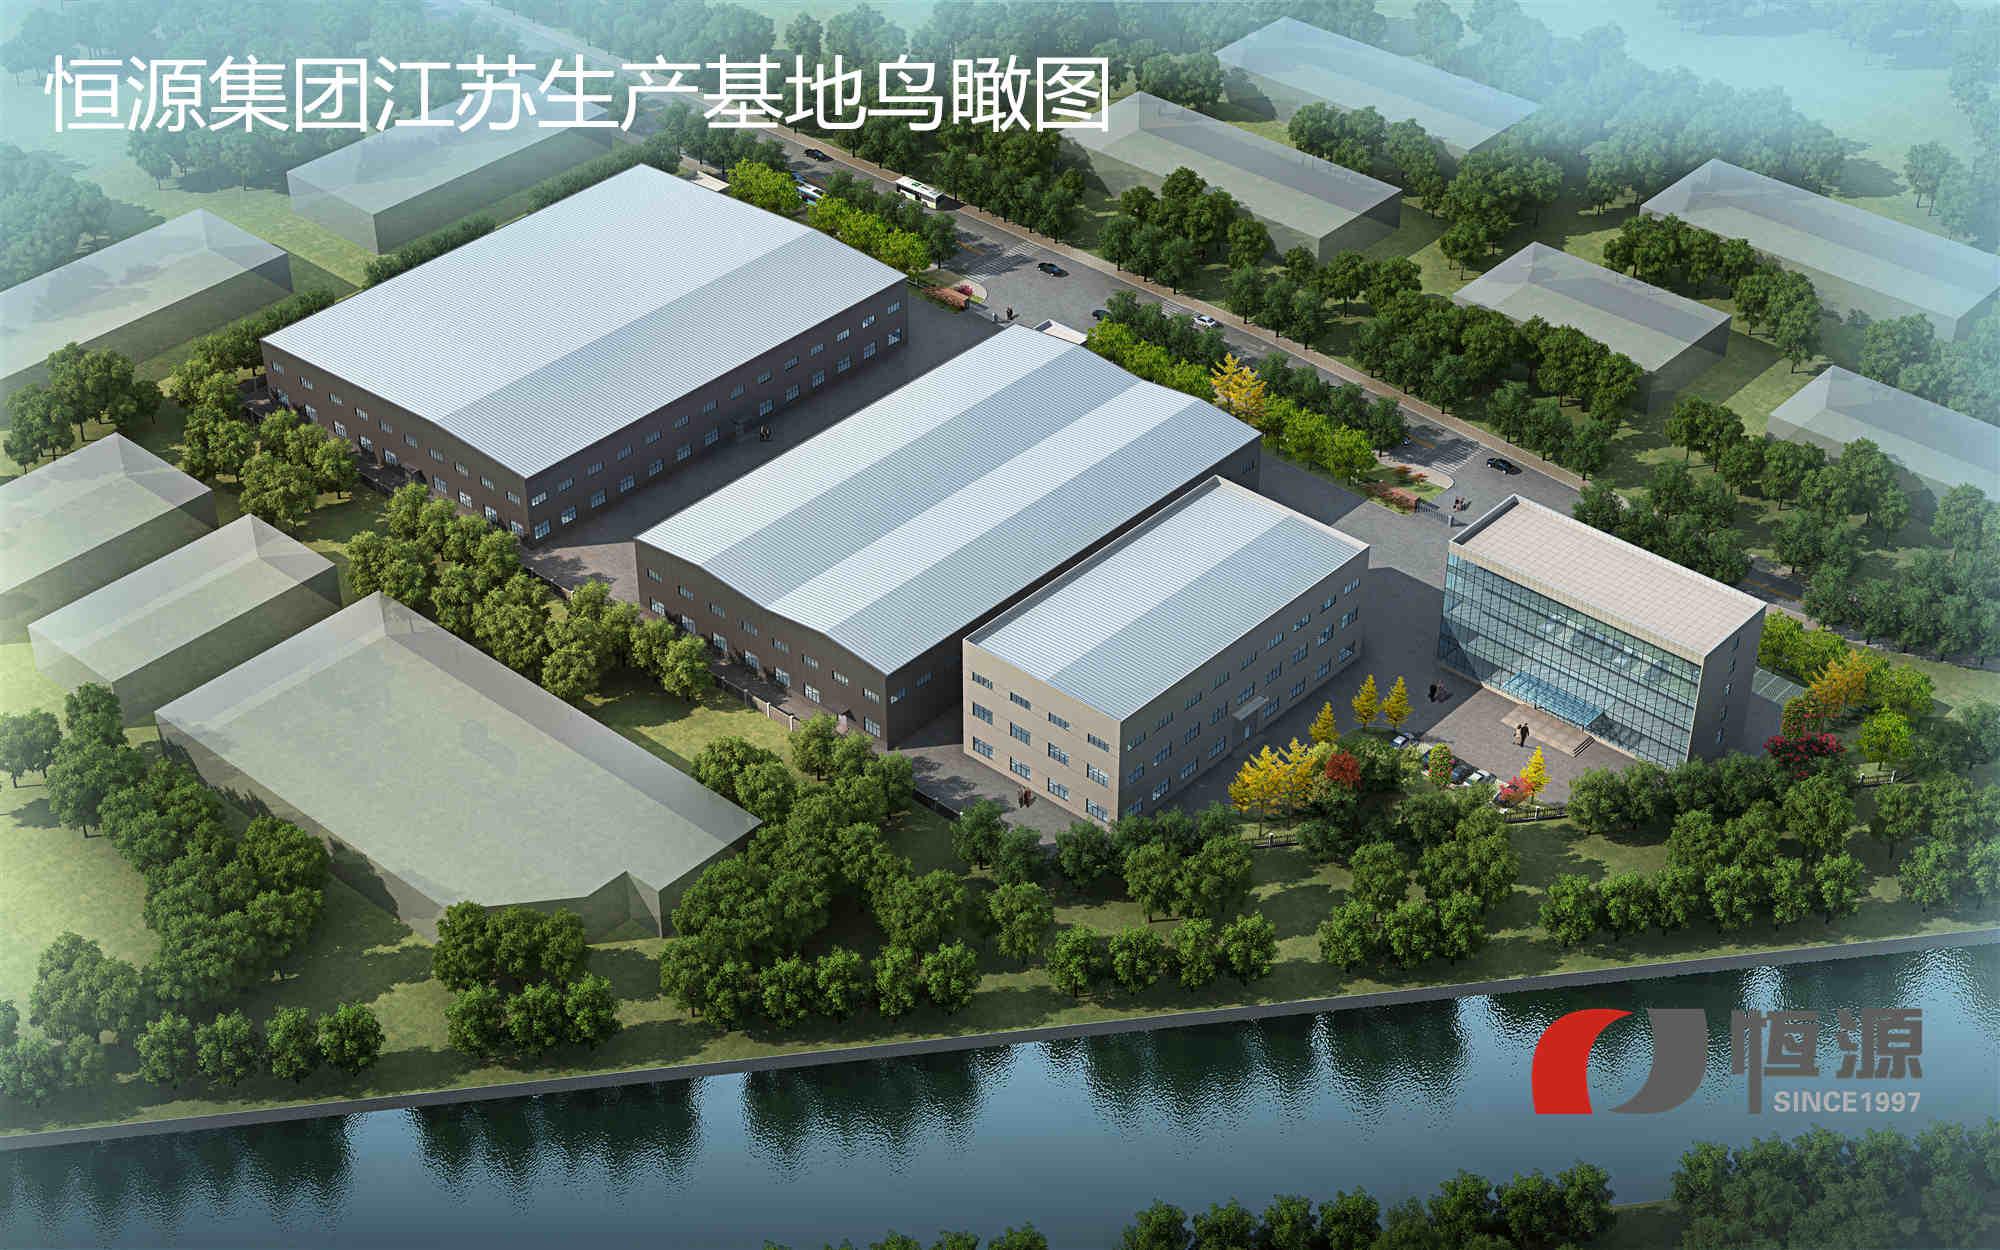 <b>恒源矿山,中国大型制砂机厂家之楷模</b>